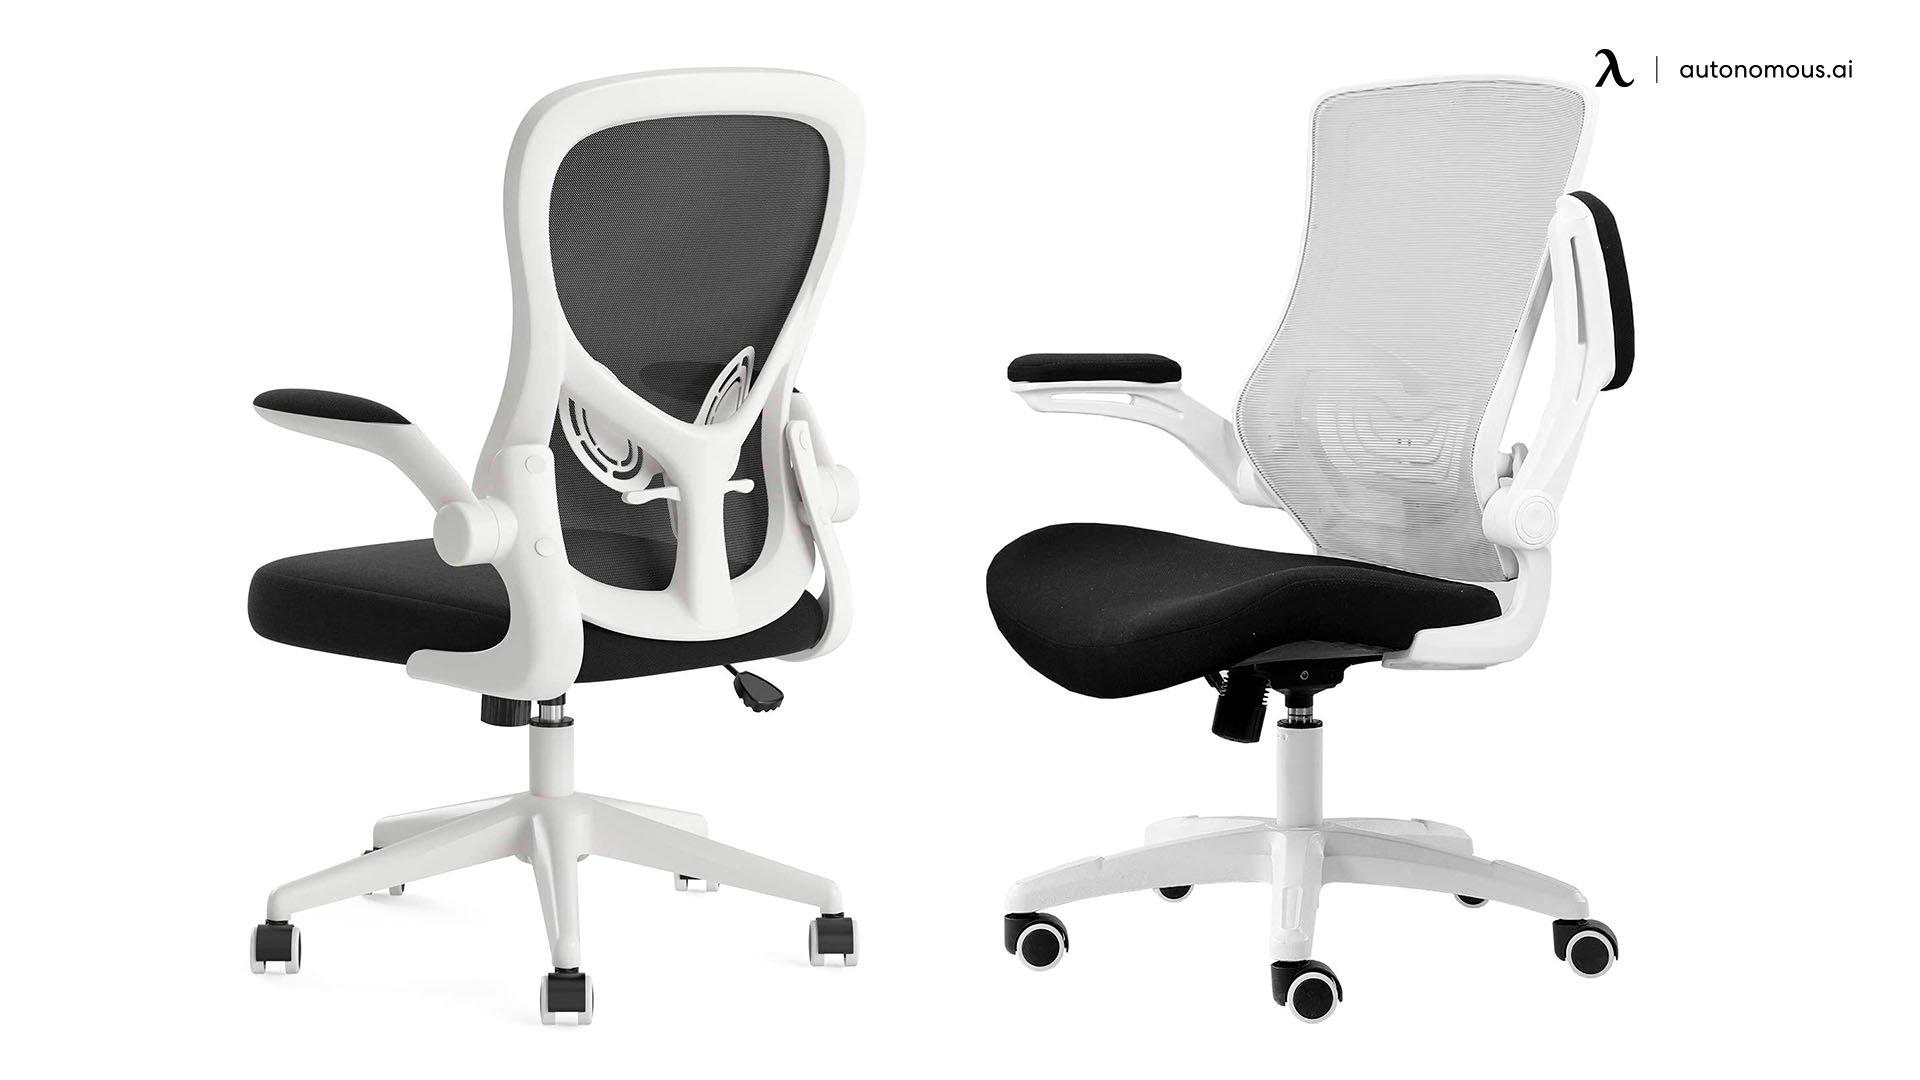 The Hbada office task desk chair